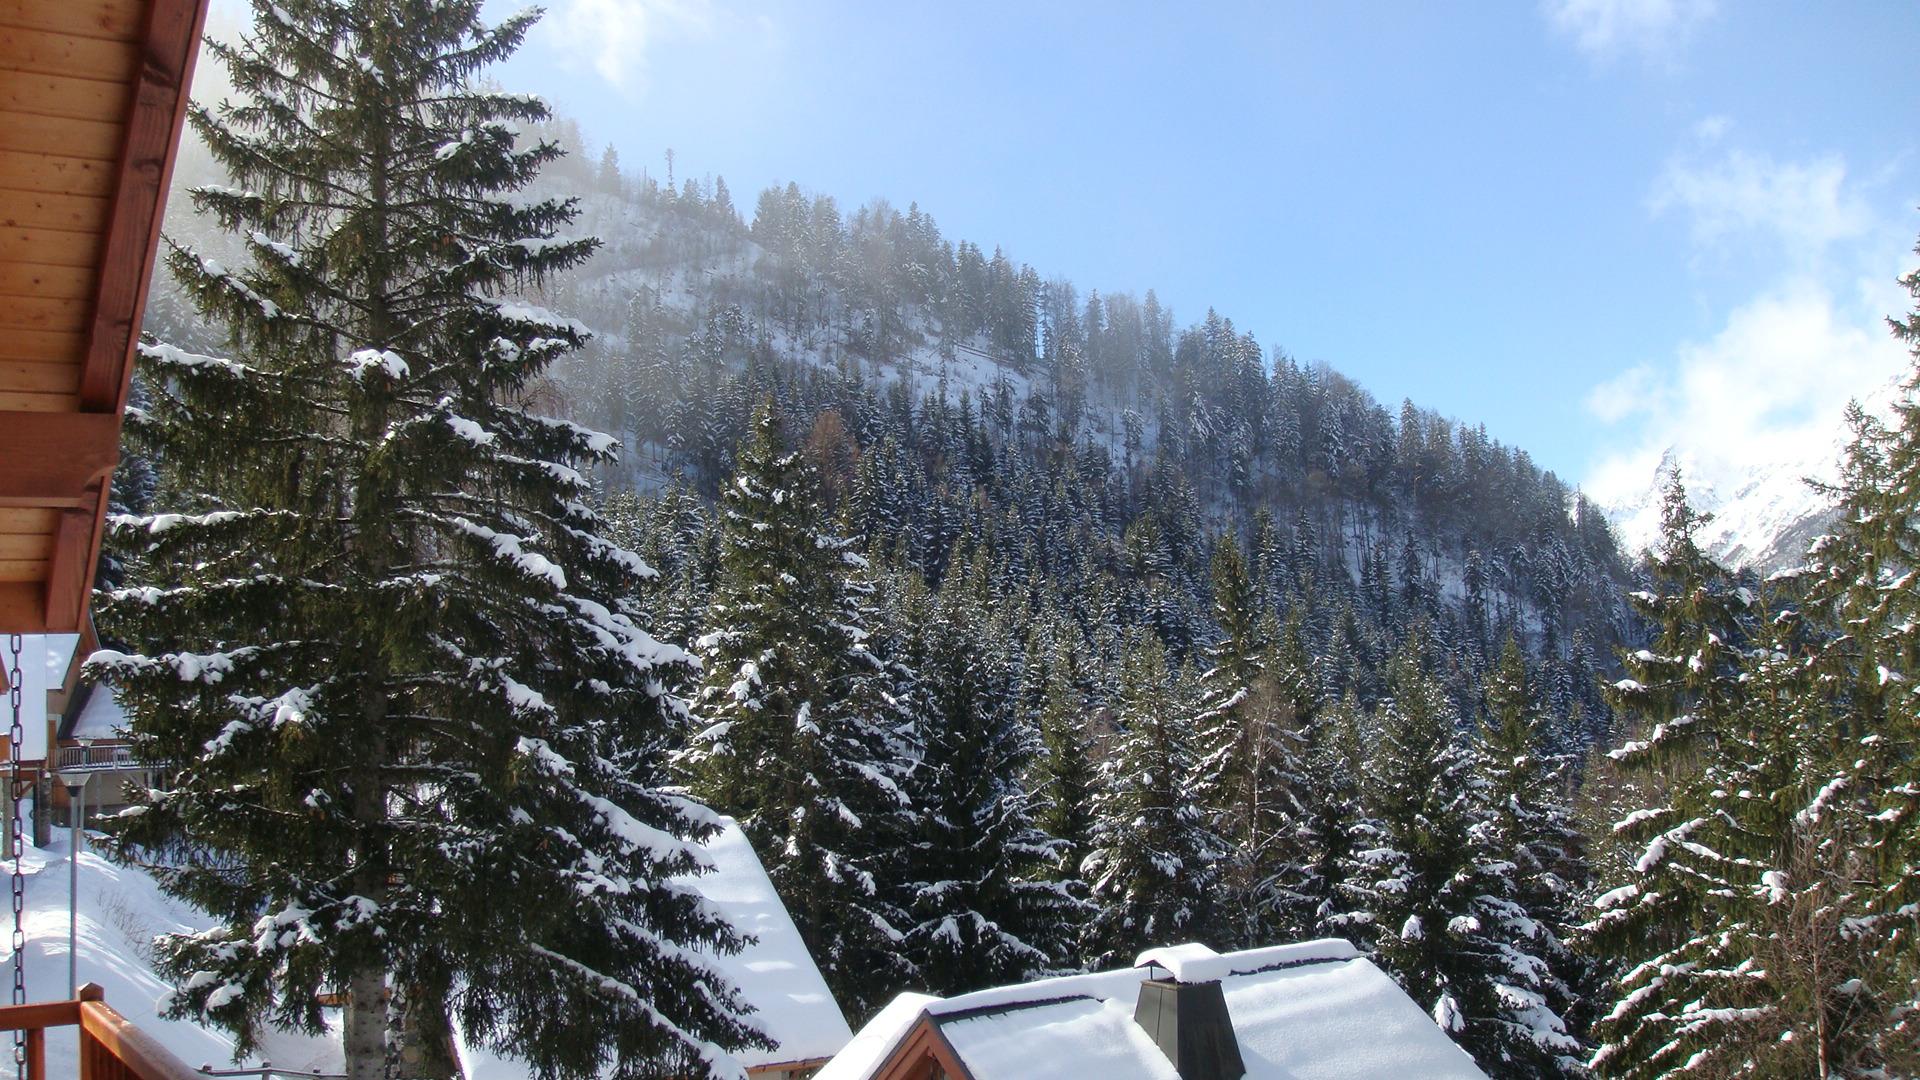 View from the balcony, Oz en Oisans